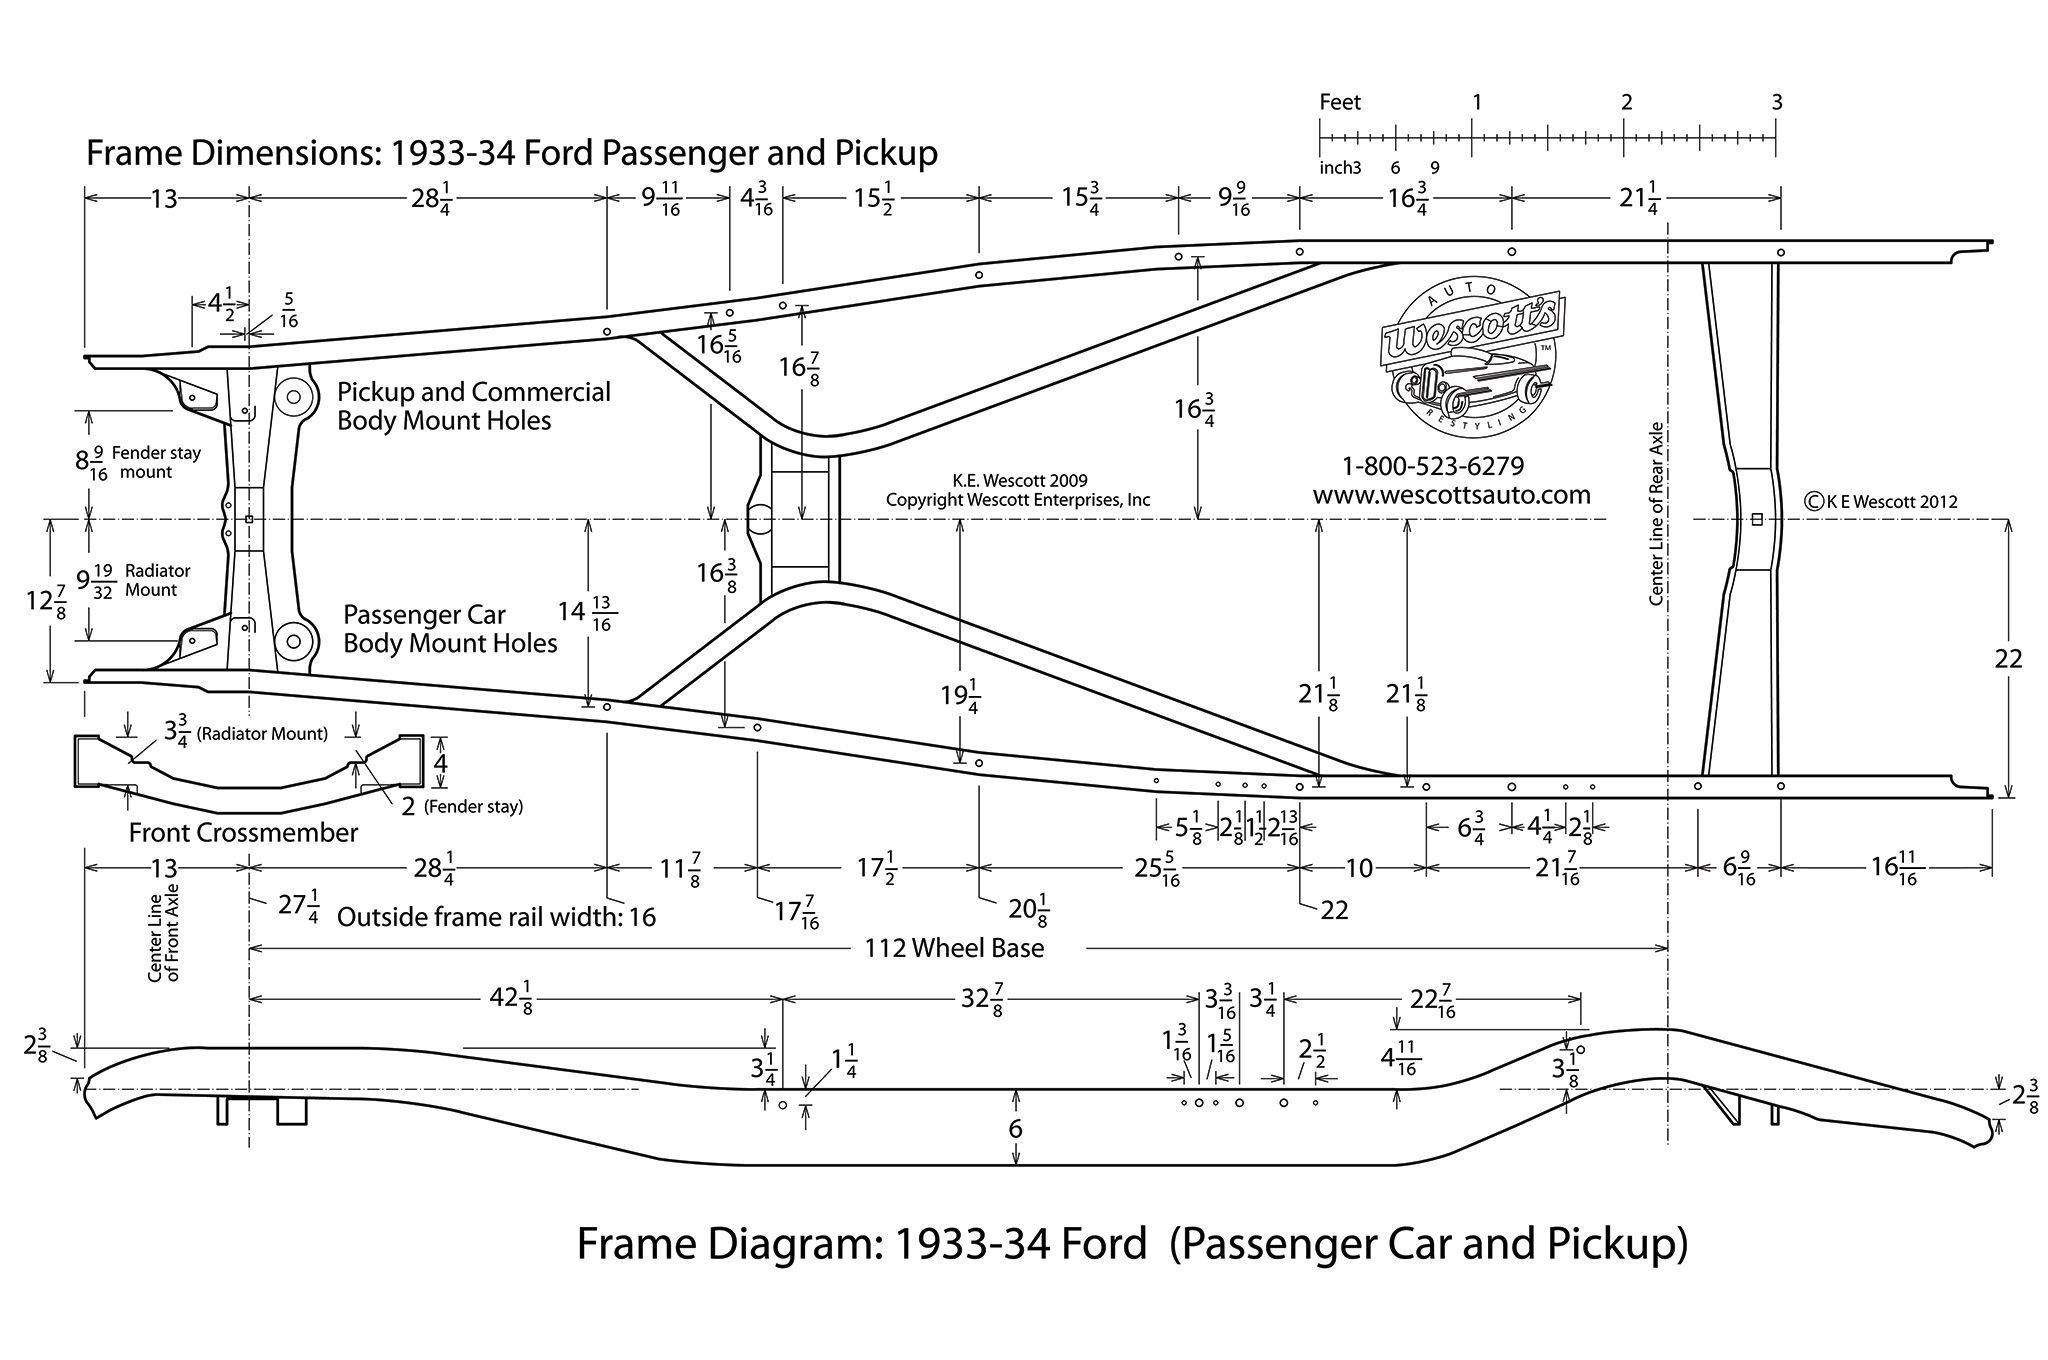 1940 Ford Frame Dimensions   Frameviewjdi.org